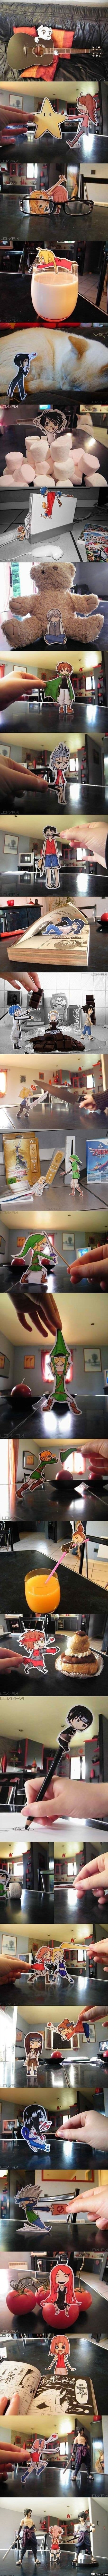 funny-anime-art